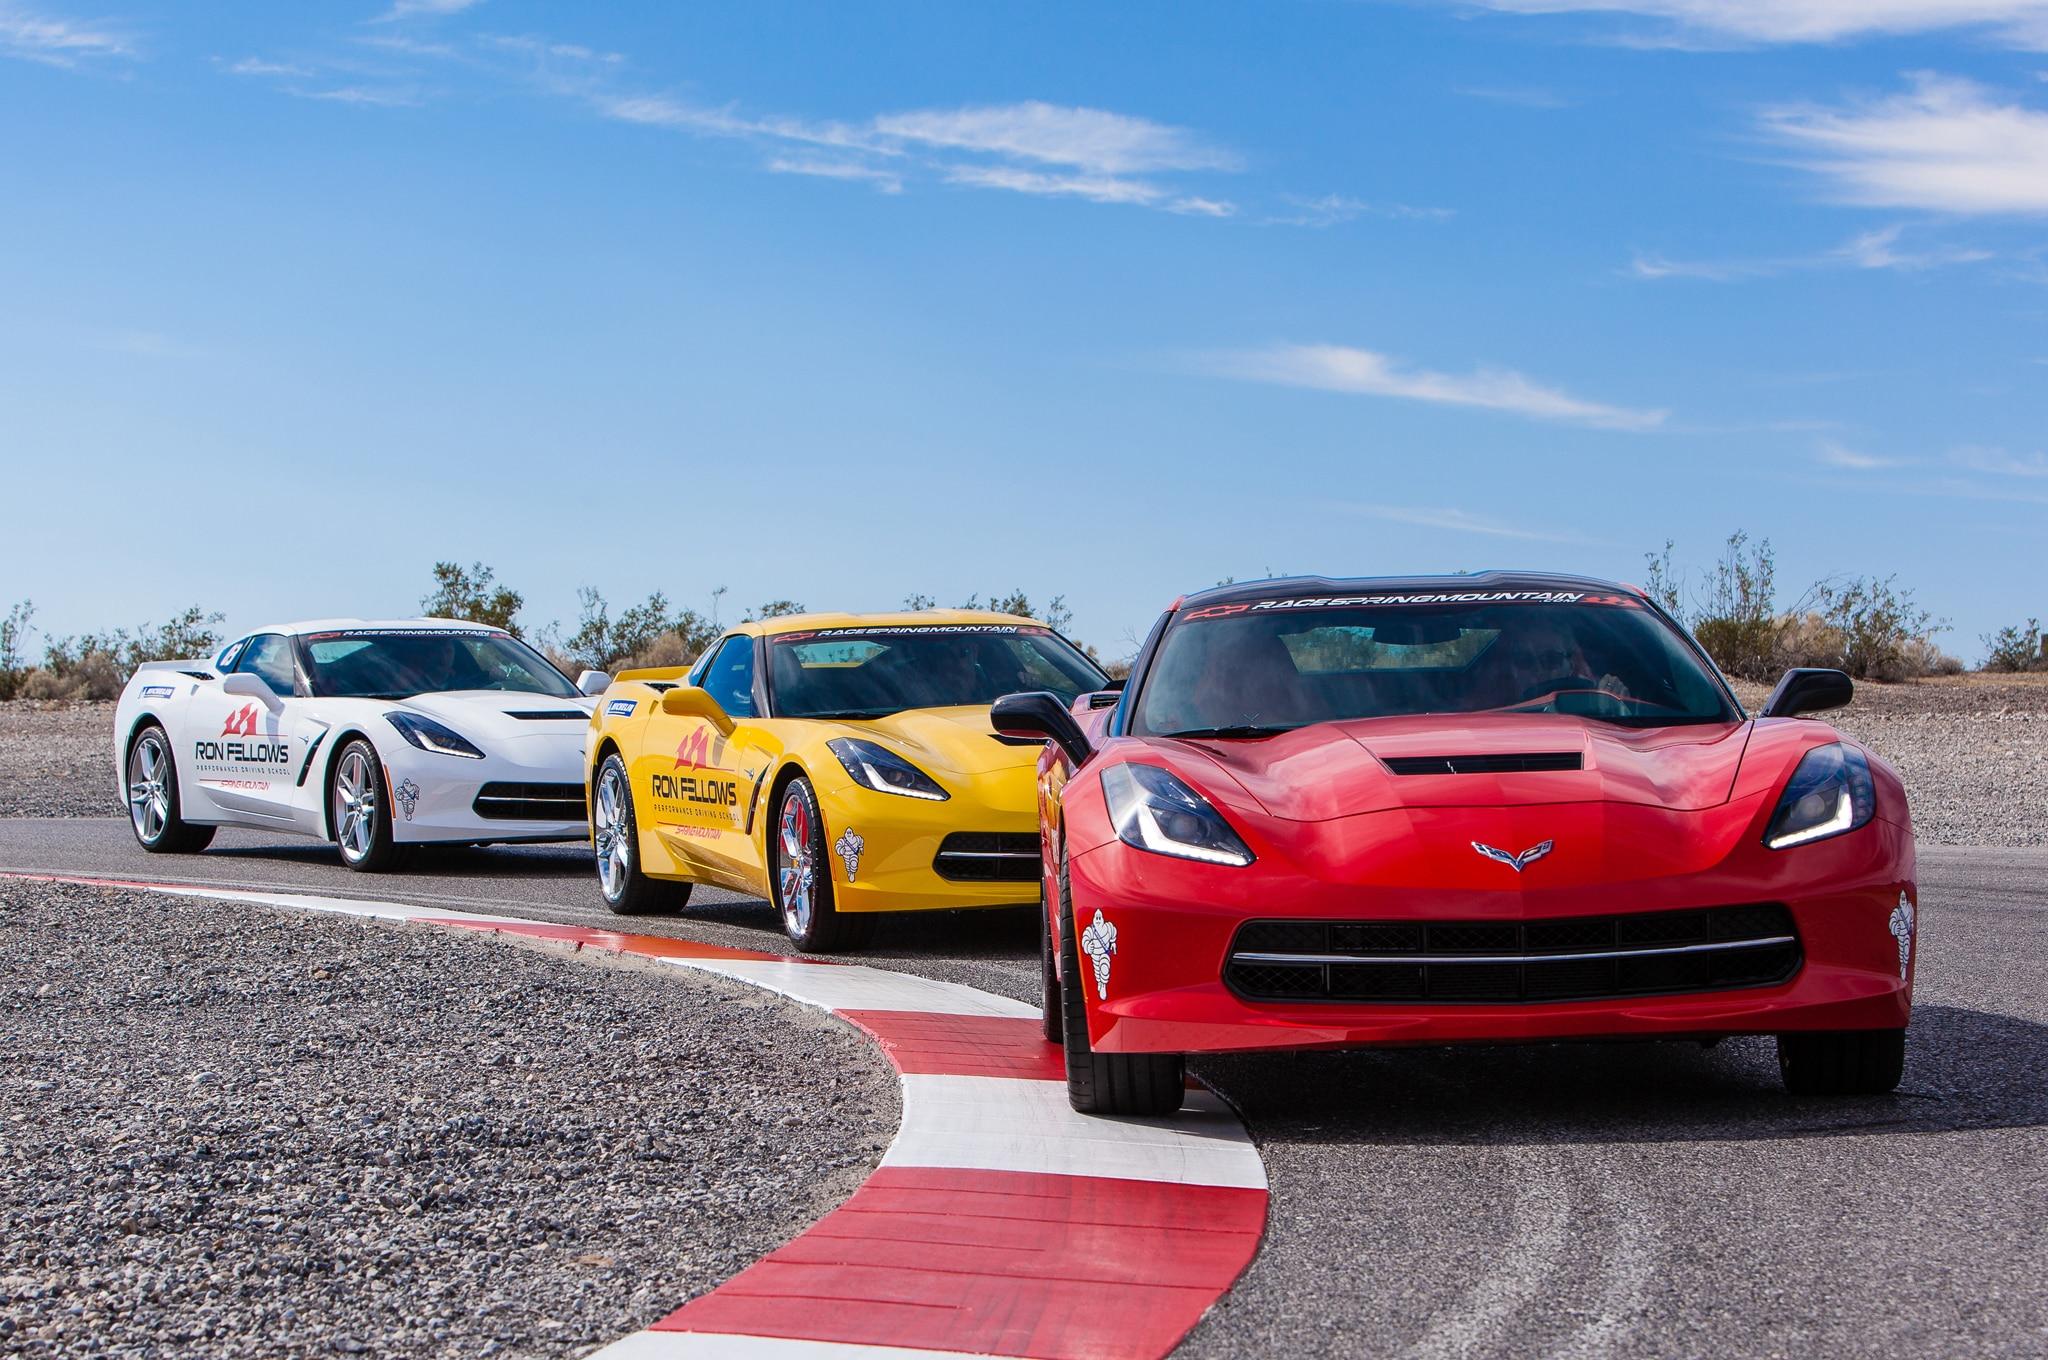 2014 Chevrolet Corvette Stingray Ron Fellows Driving School Trio1